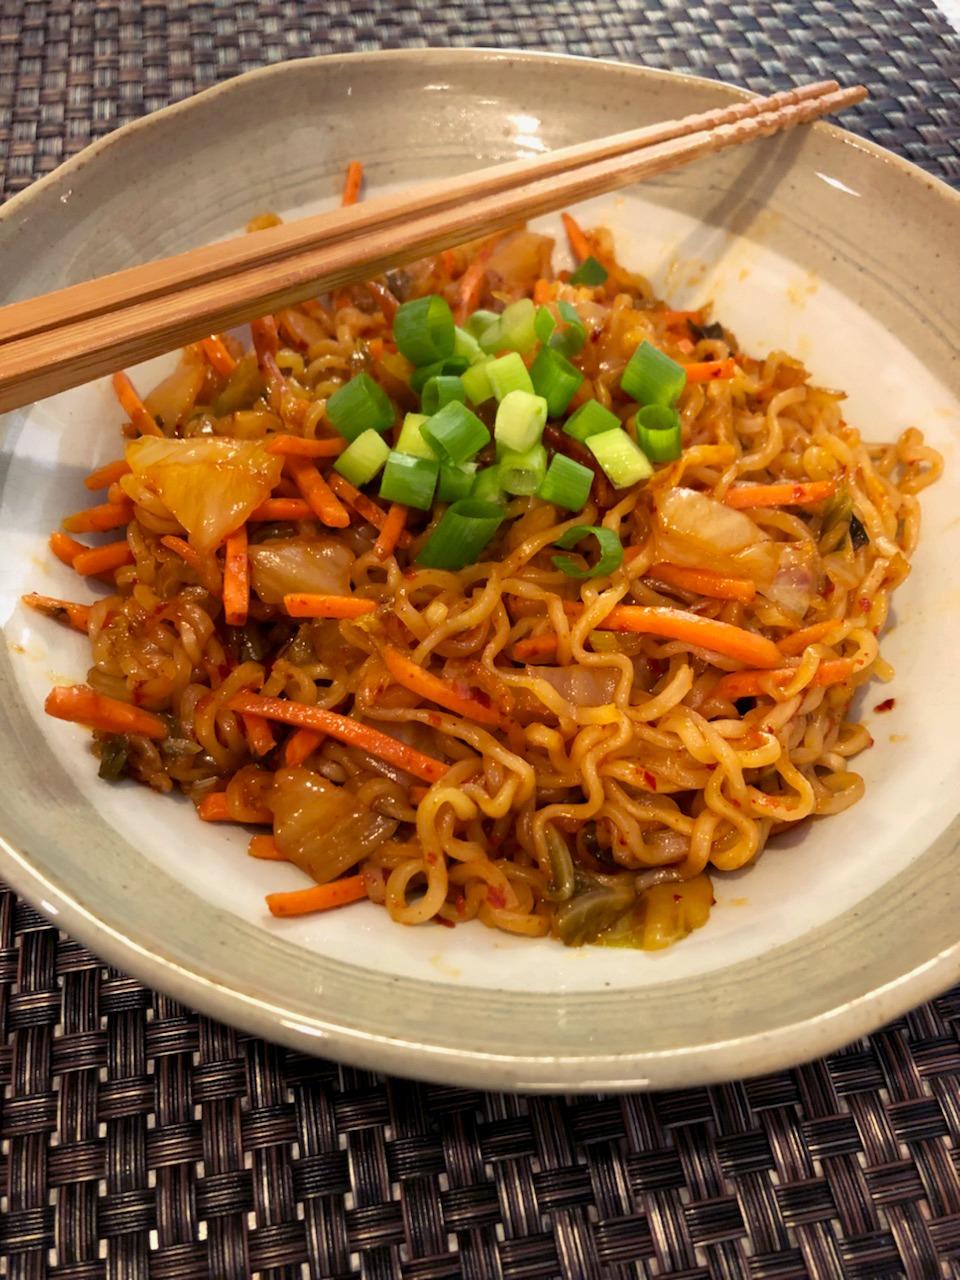 Kimchi Udon Noodle Stir-Fry